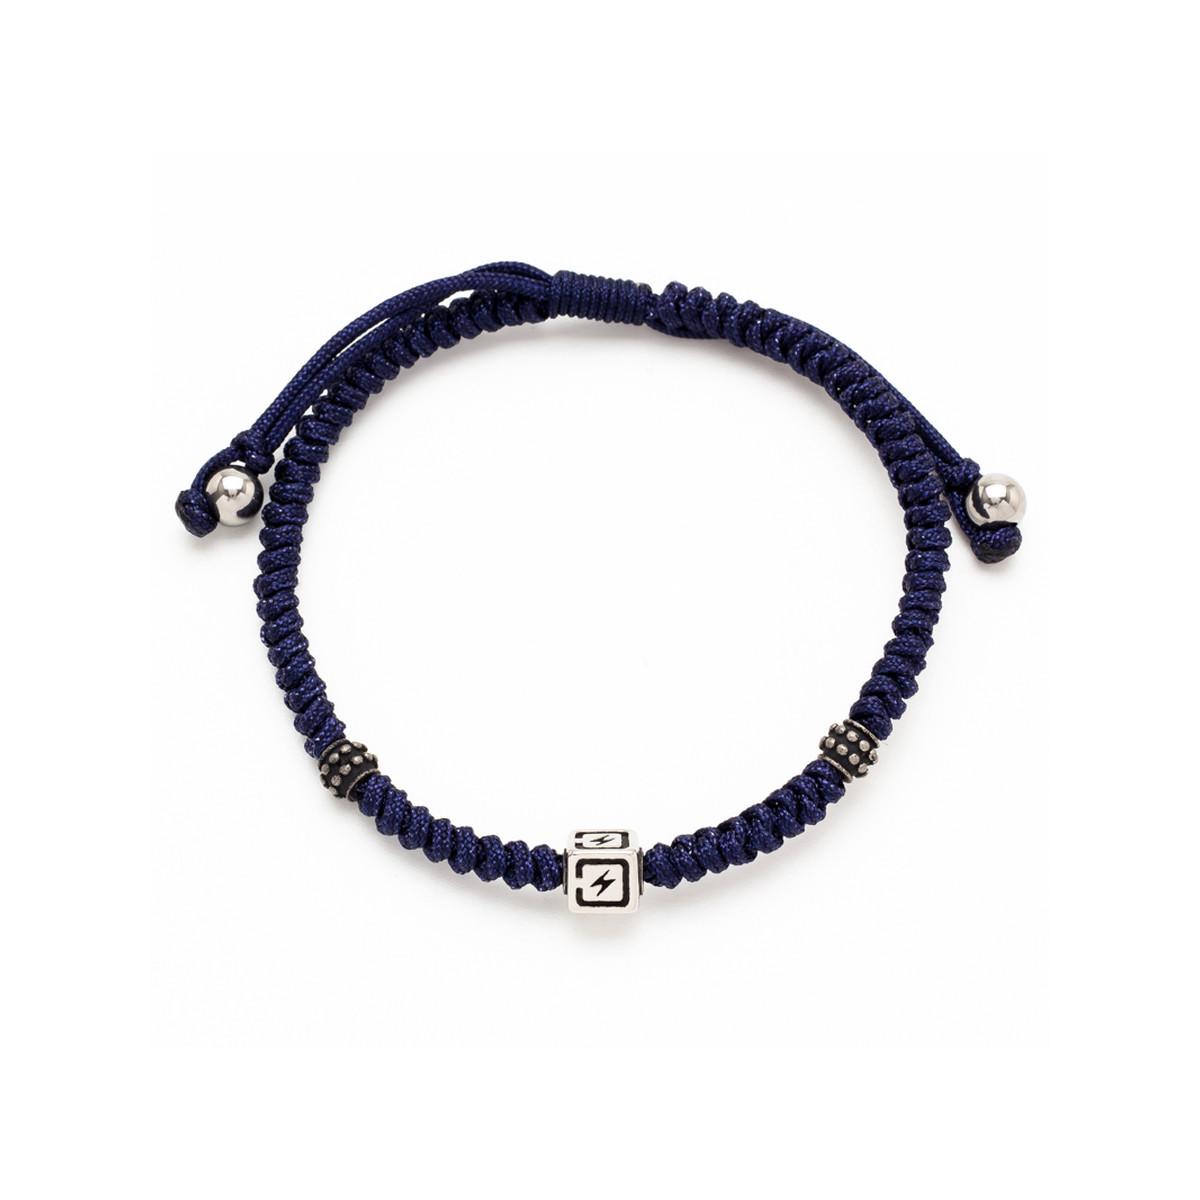 pas mal f83a3 14afb Bracelet cordon bleu marine